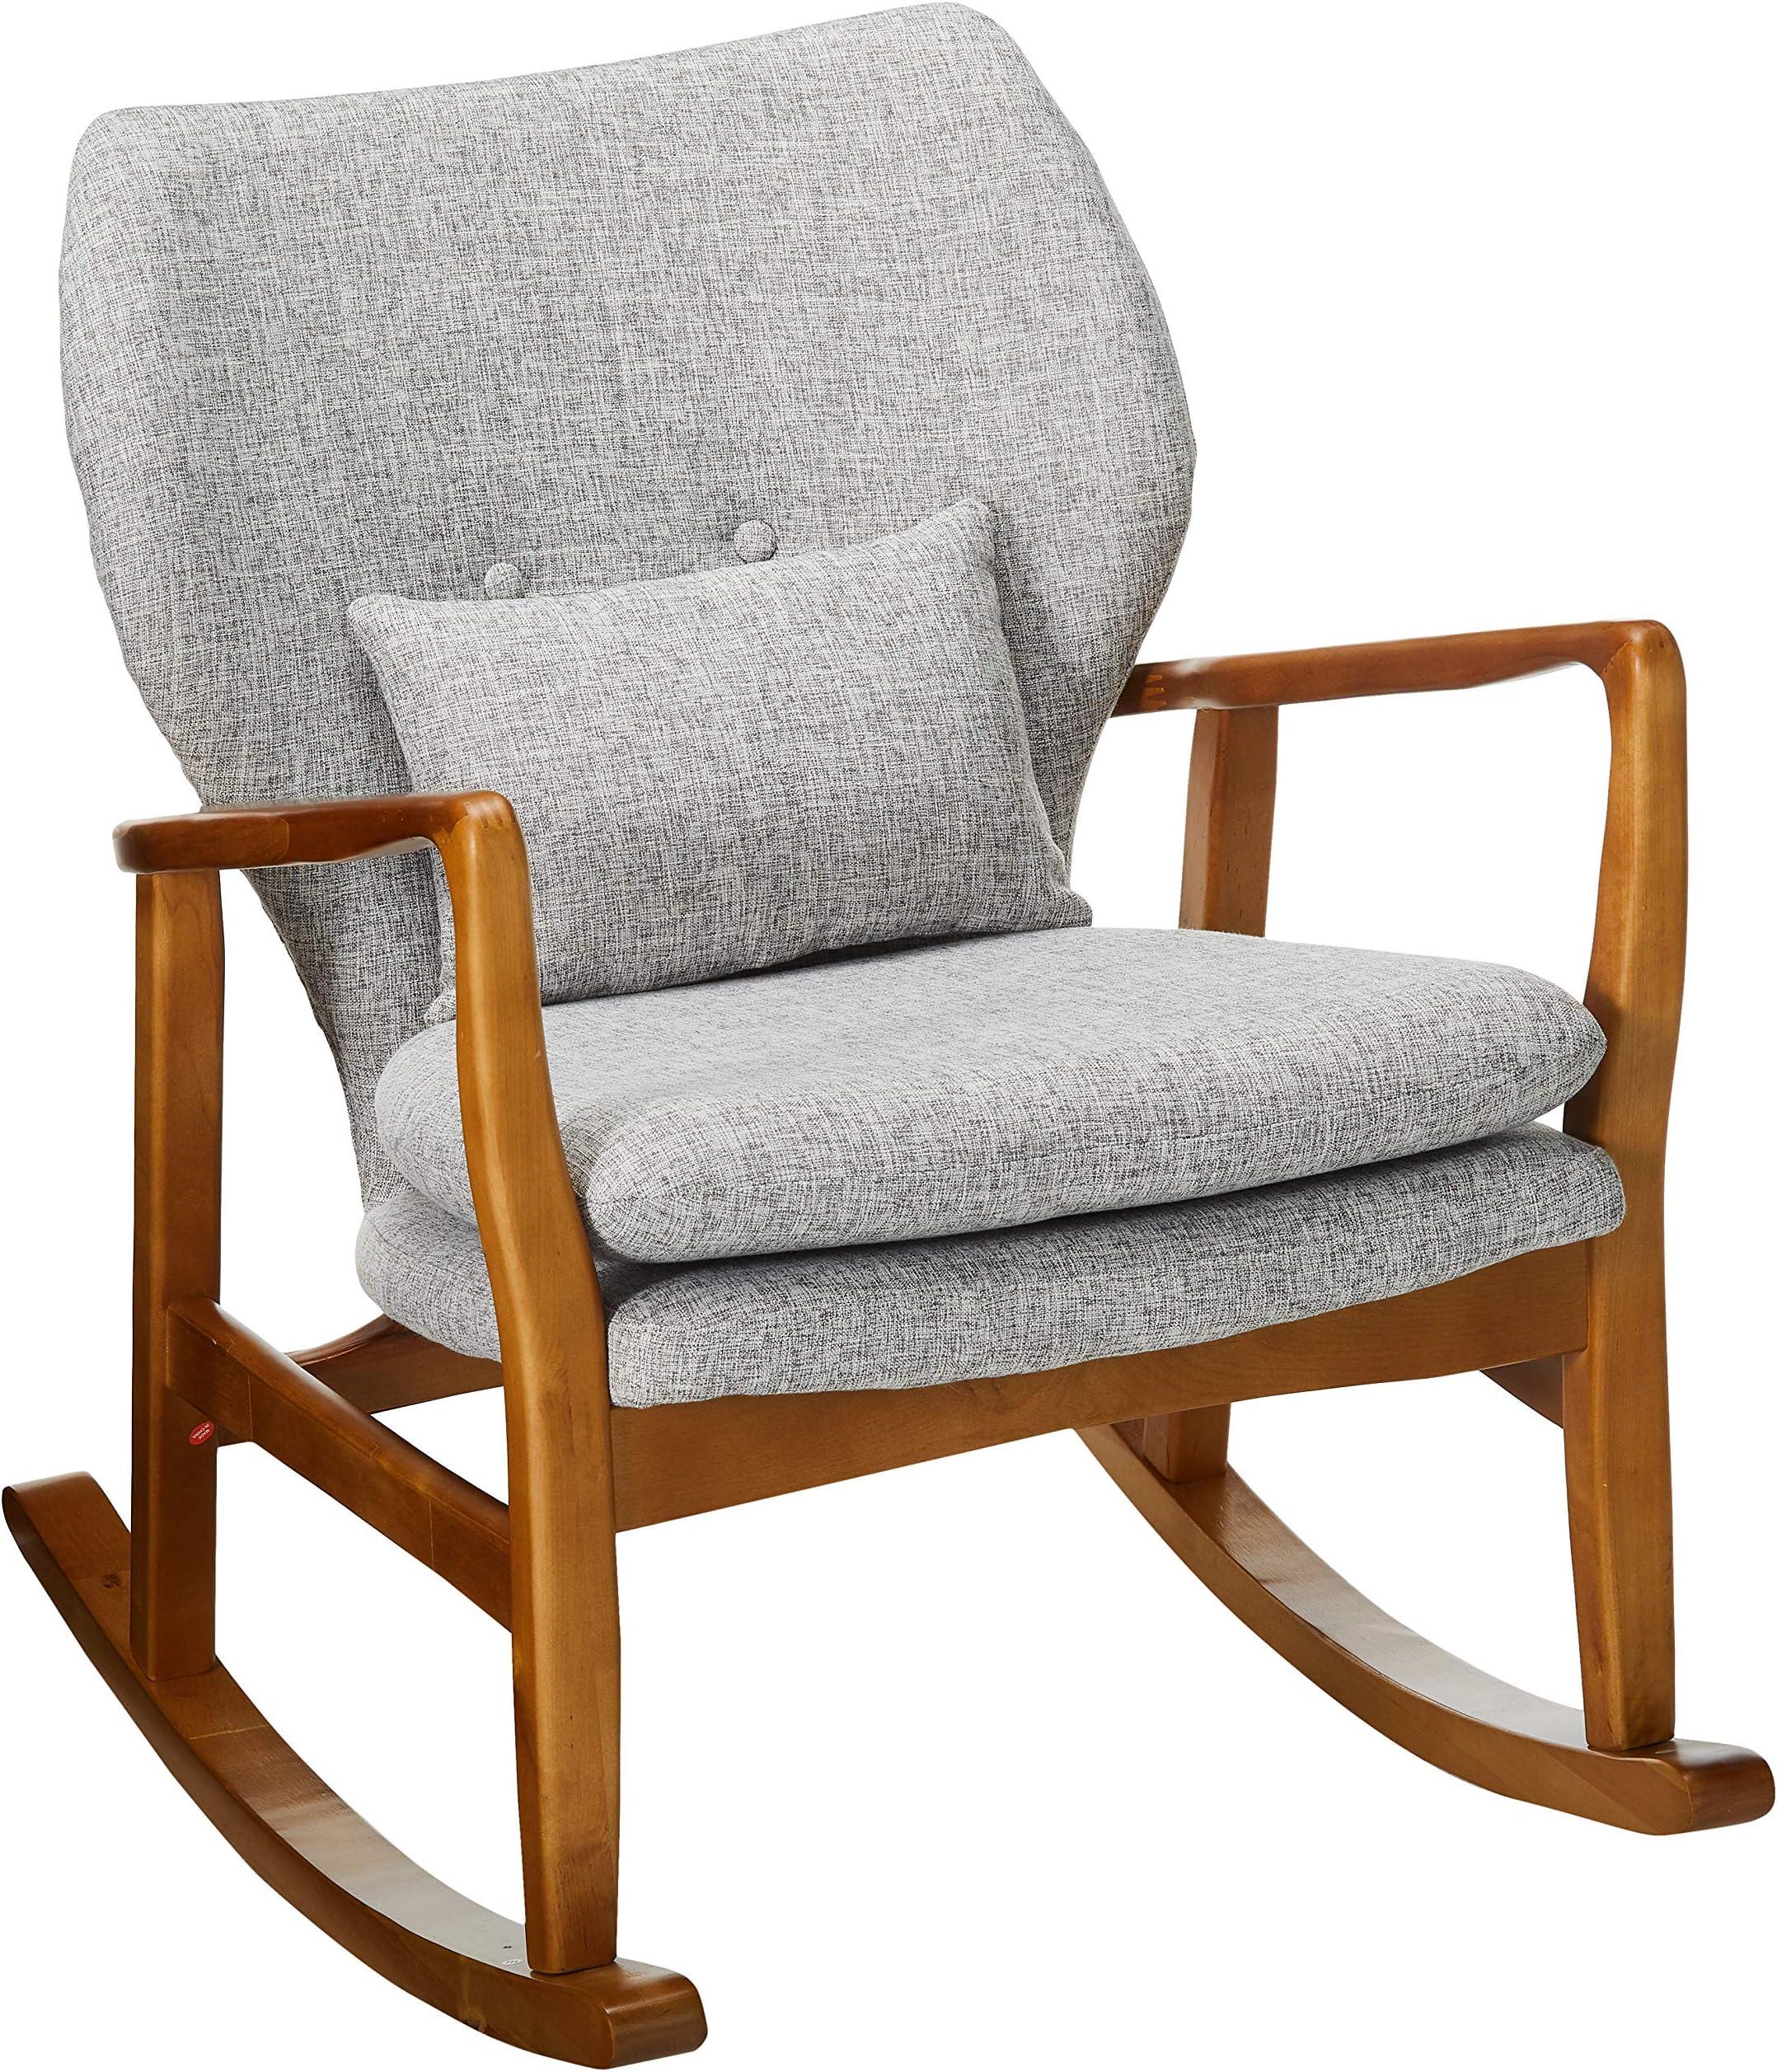 Christopher Knight Home Benny Mid-Century Modern Fabric Rocking Chair, Light Grey Tweed / Light Walnut